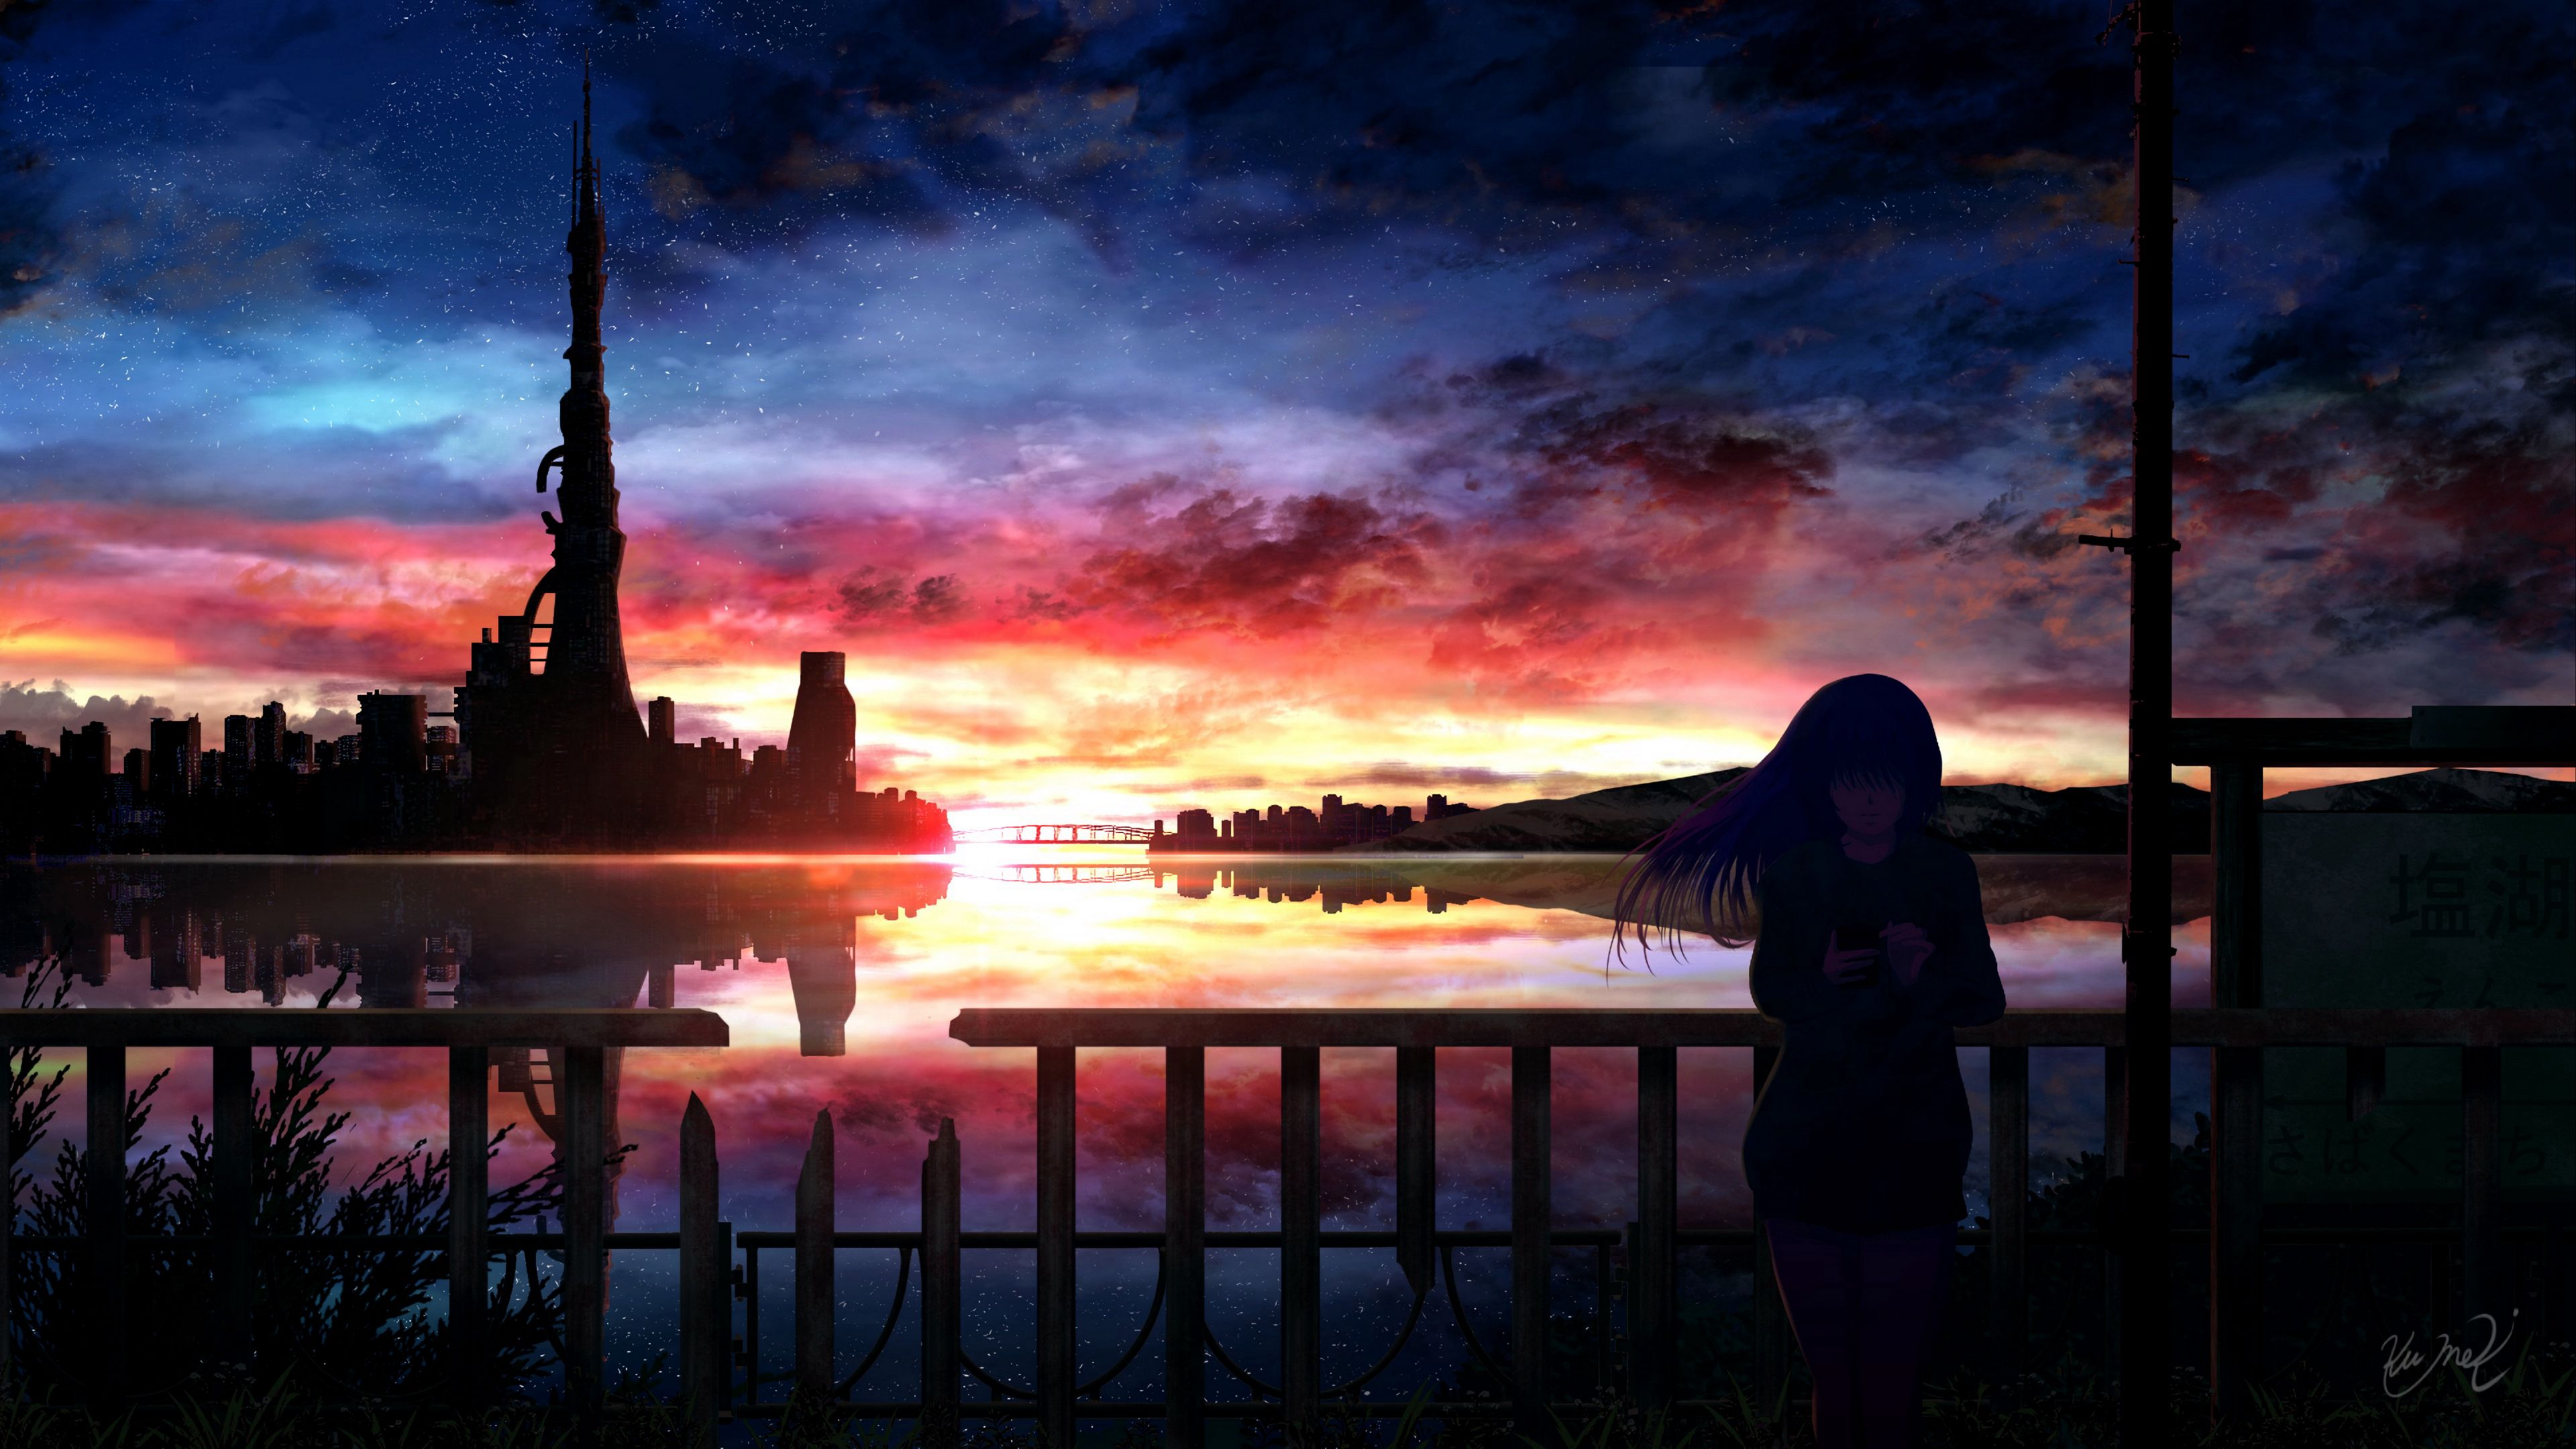 3840x2160 Wallpaper silhouette, night, starry sky, girl, anime